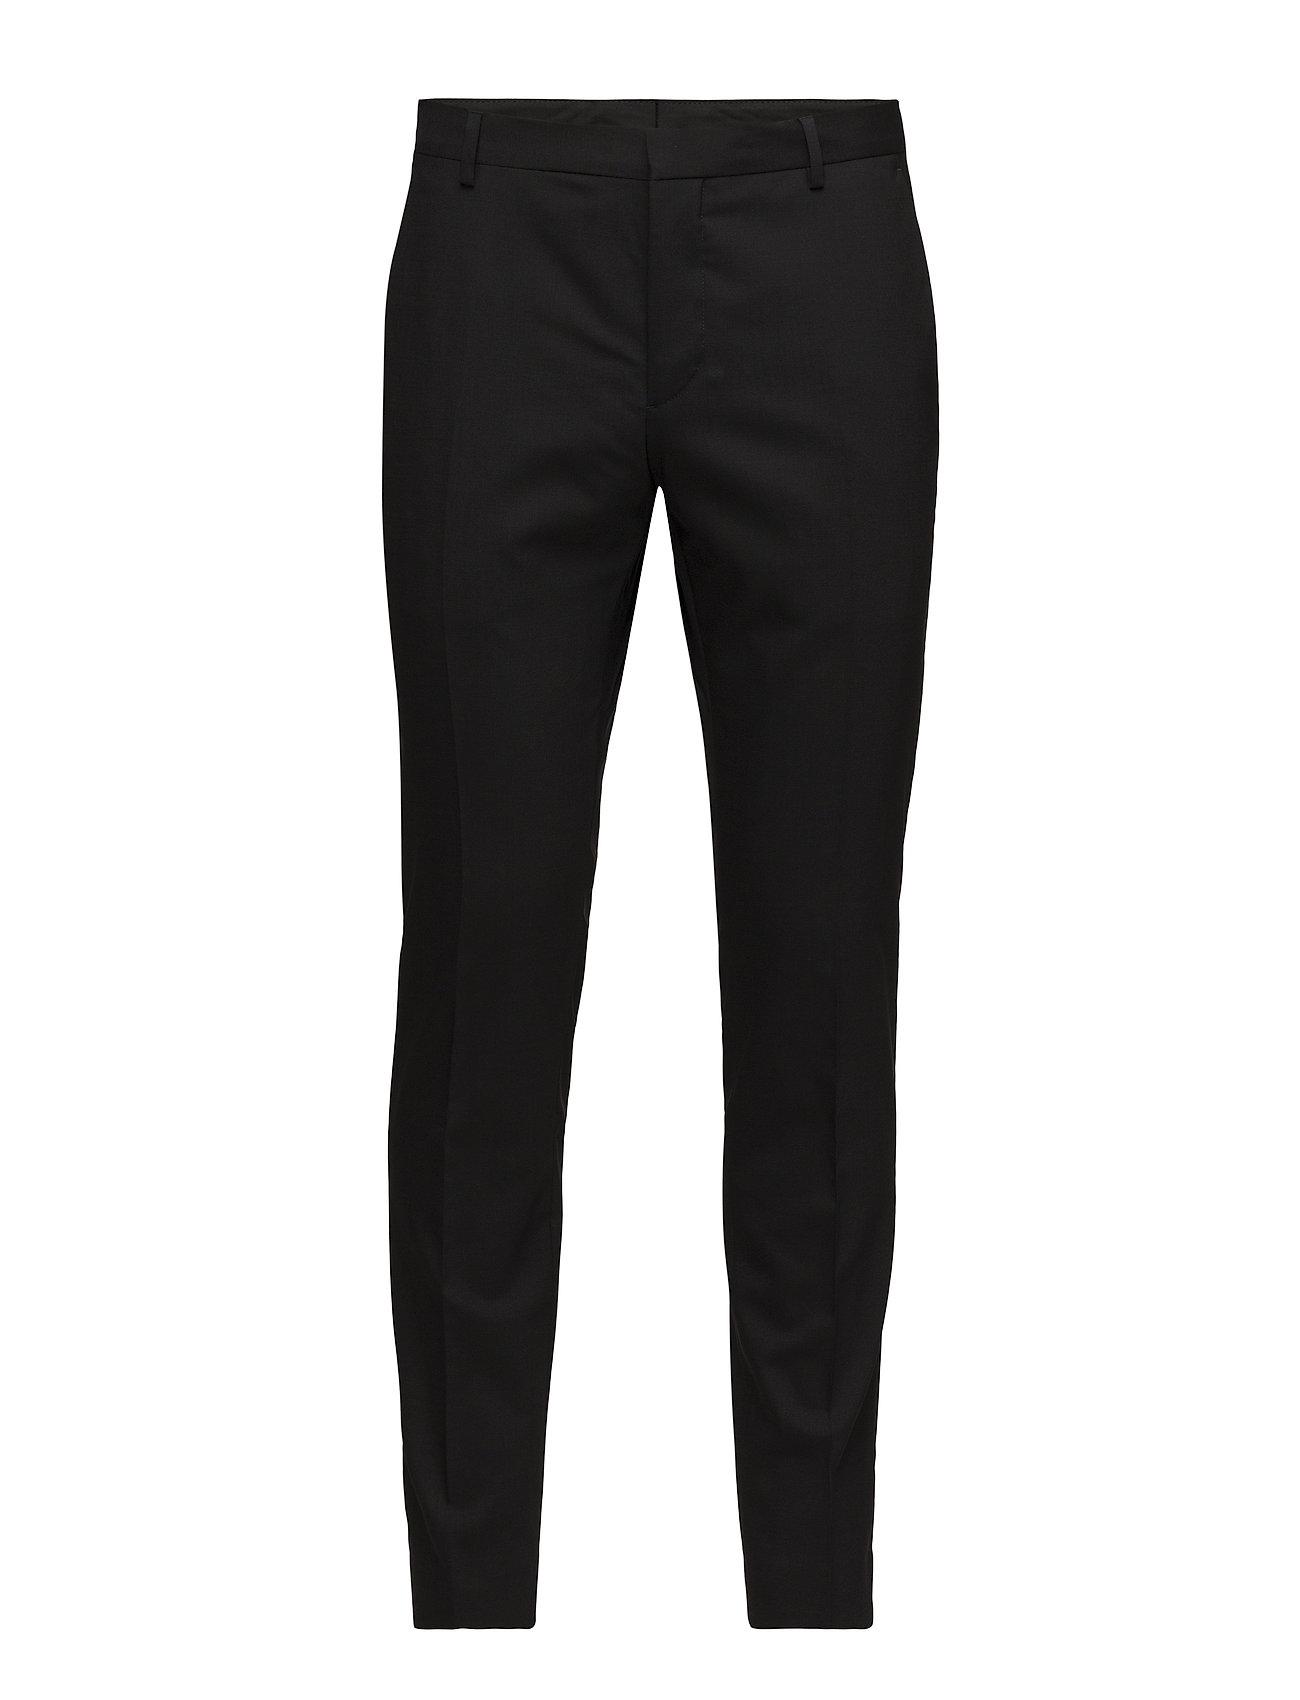 Calvin Klein STRETCH WOOL SLIM SU - PERFECT BLACK